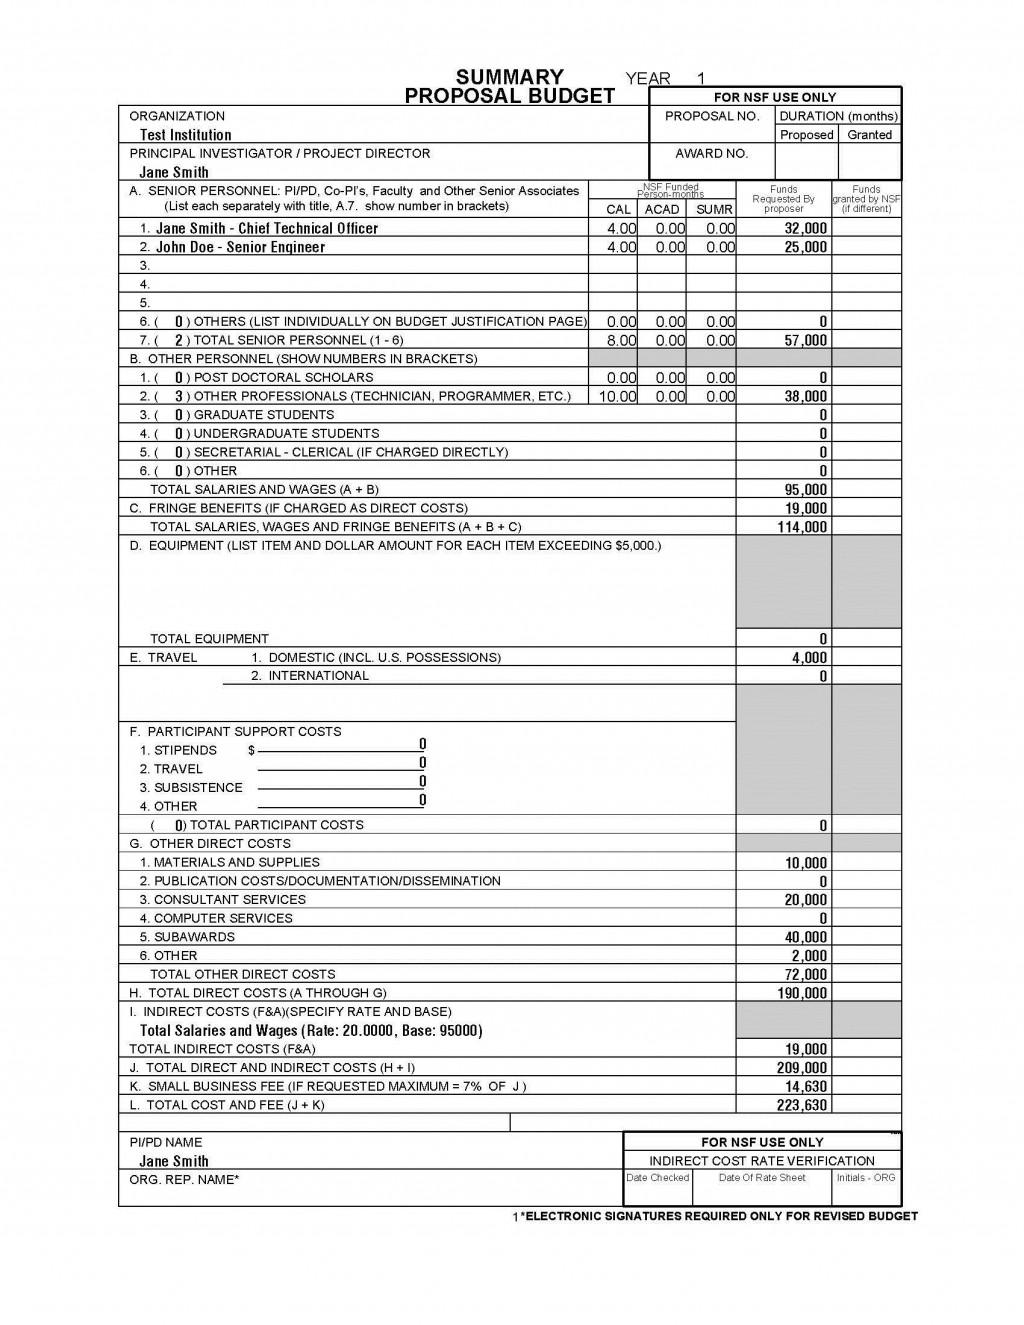 002 Breathtaking Line Item Budget Sample High Definition  Church For Grant Proposal FormatLarge